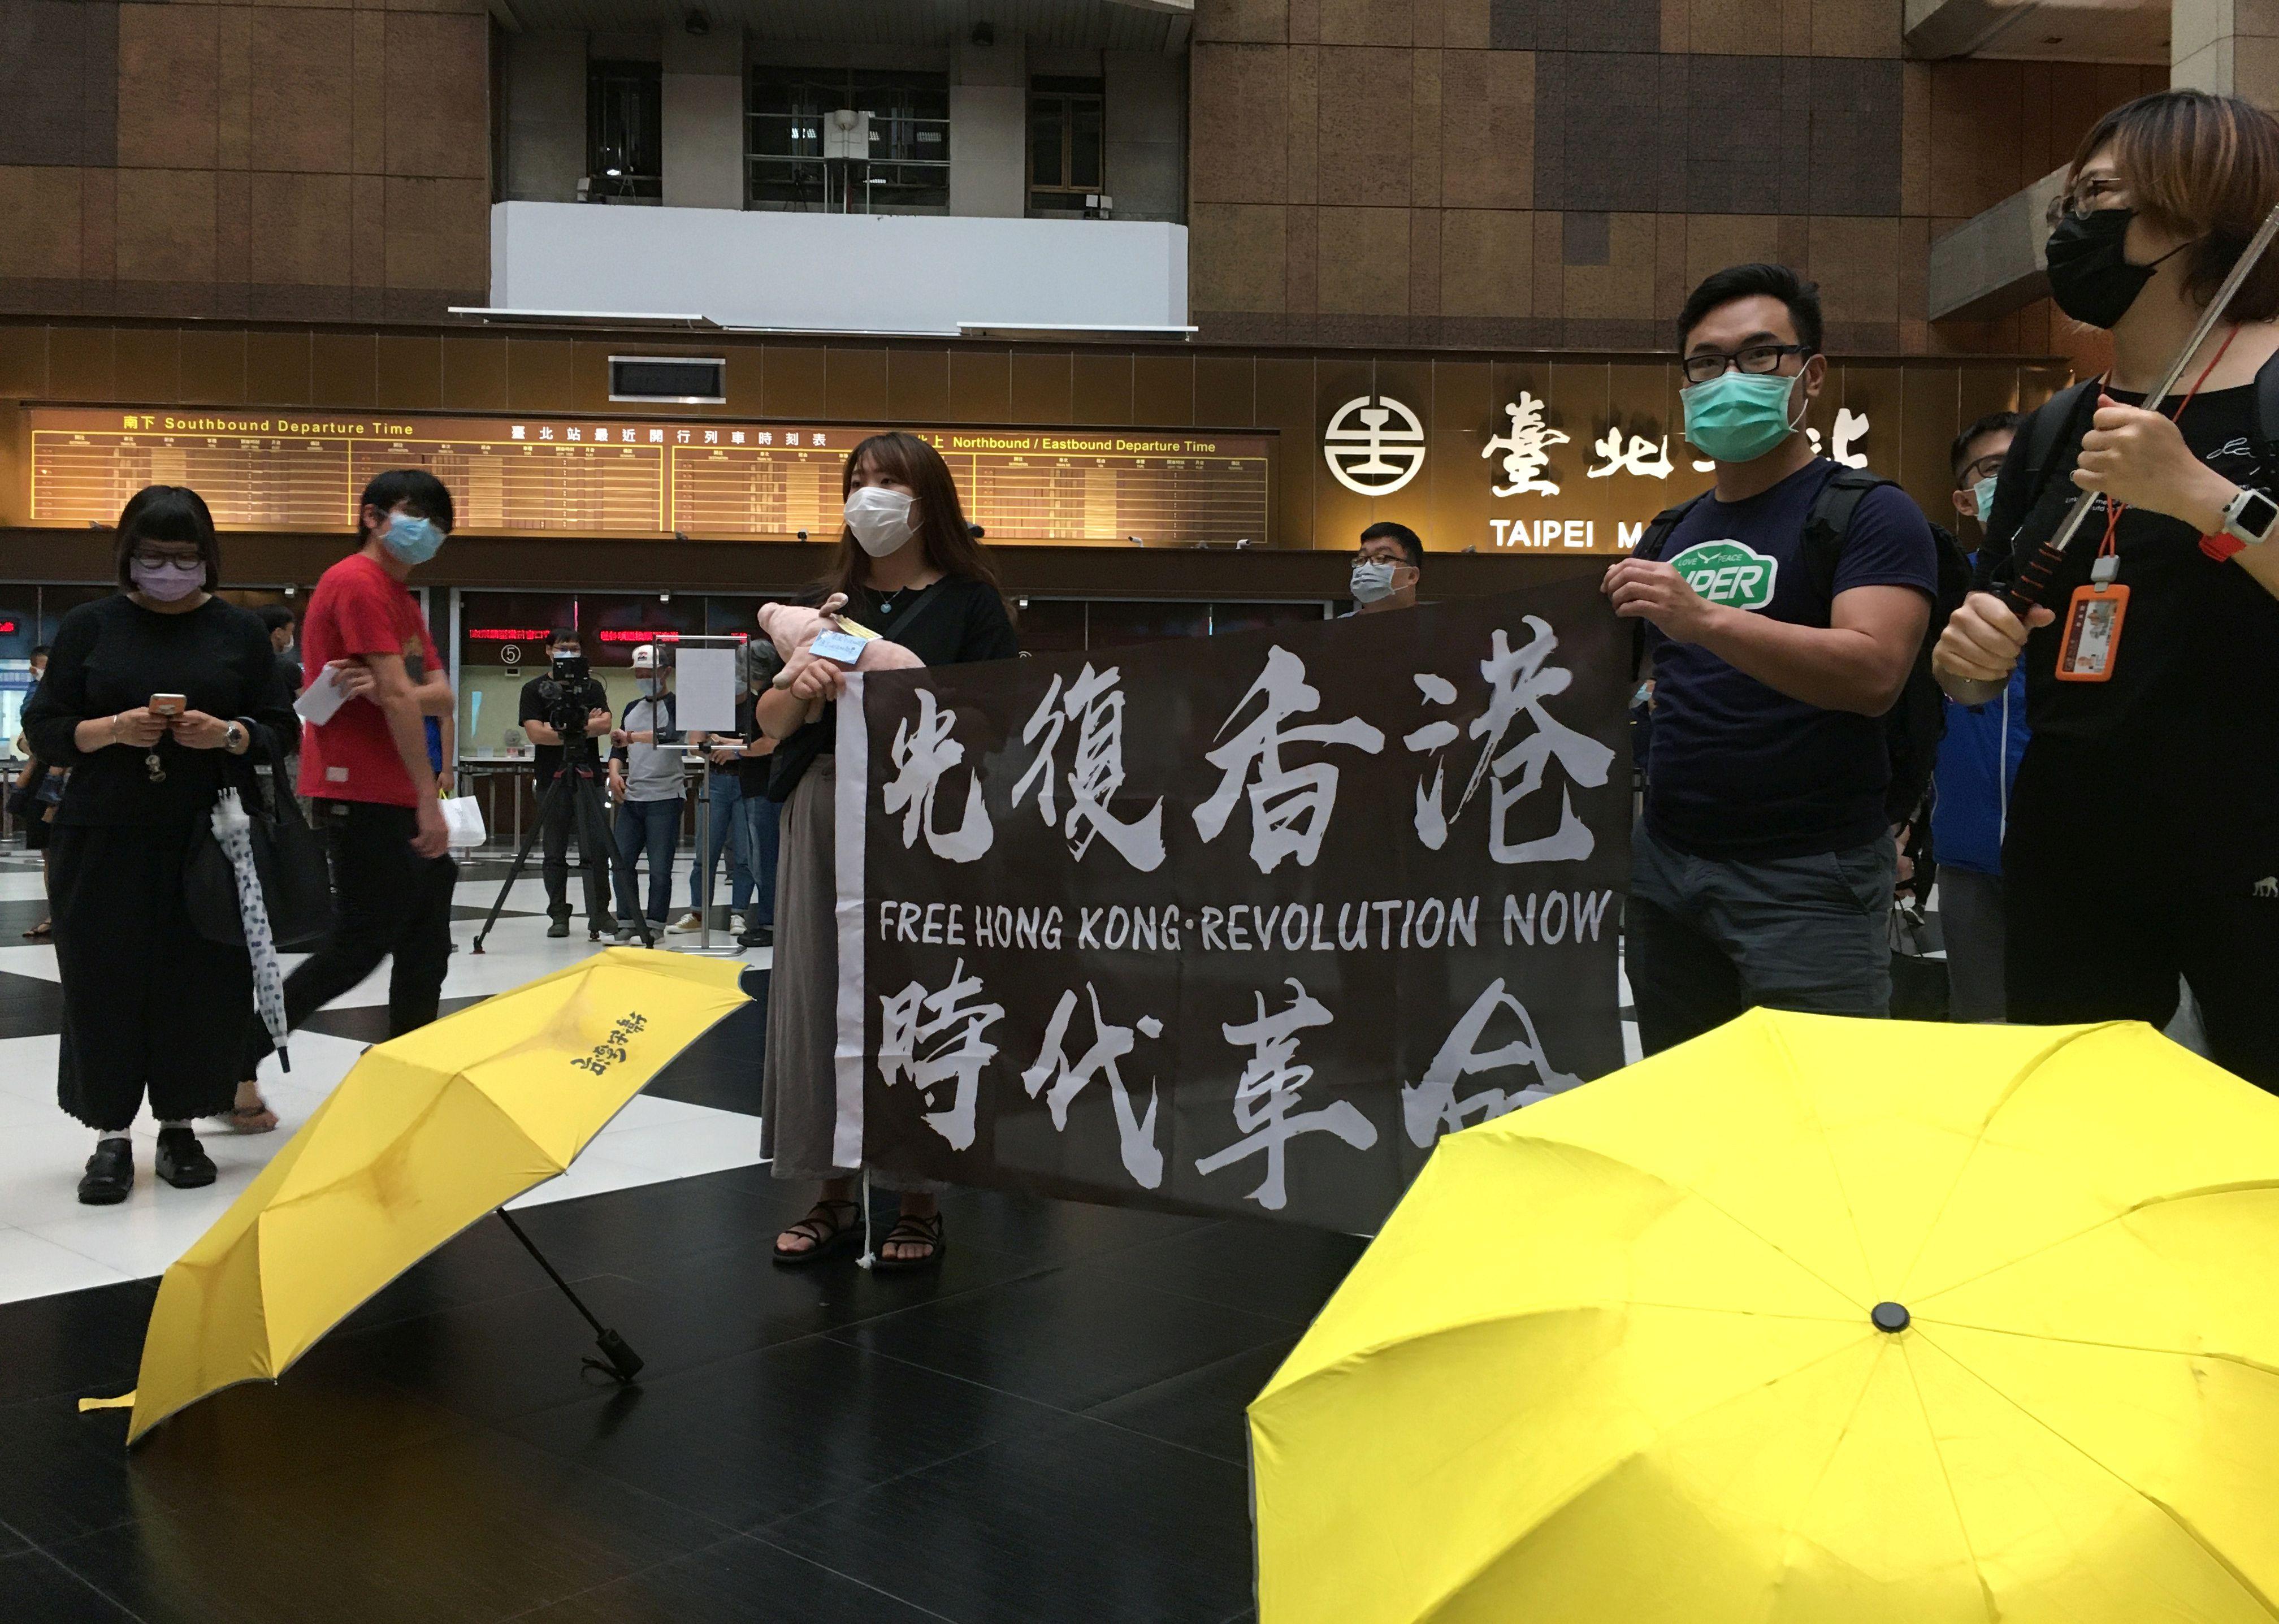 Protestantes de Hong Kong exhiben afiches en favor de la libertd